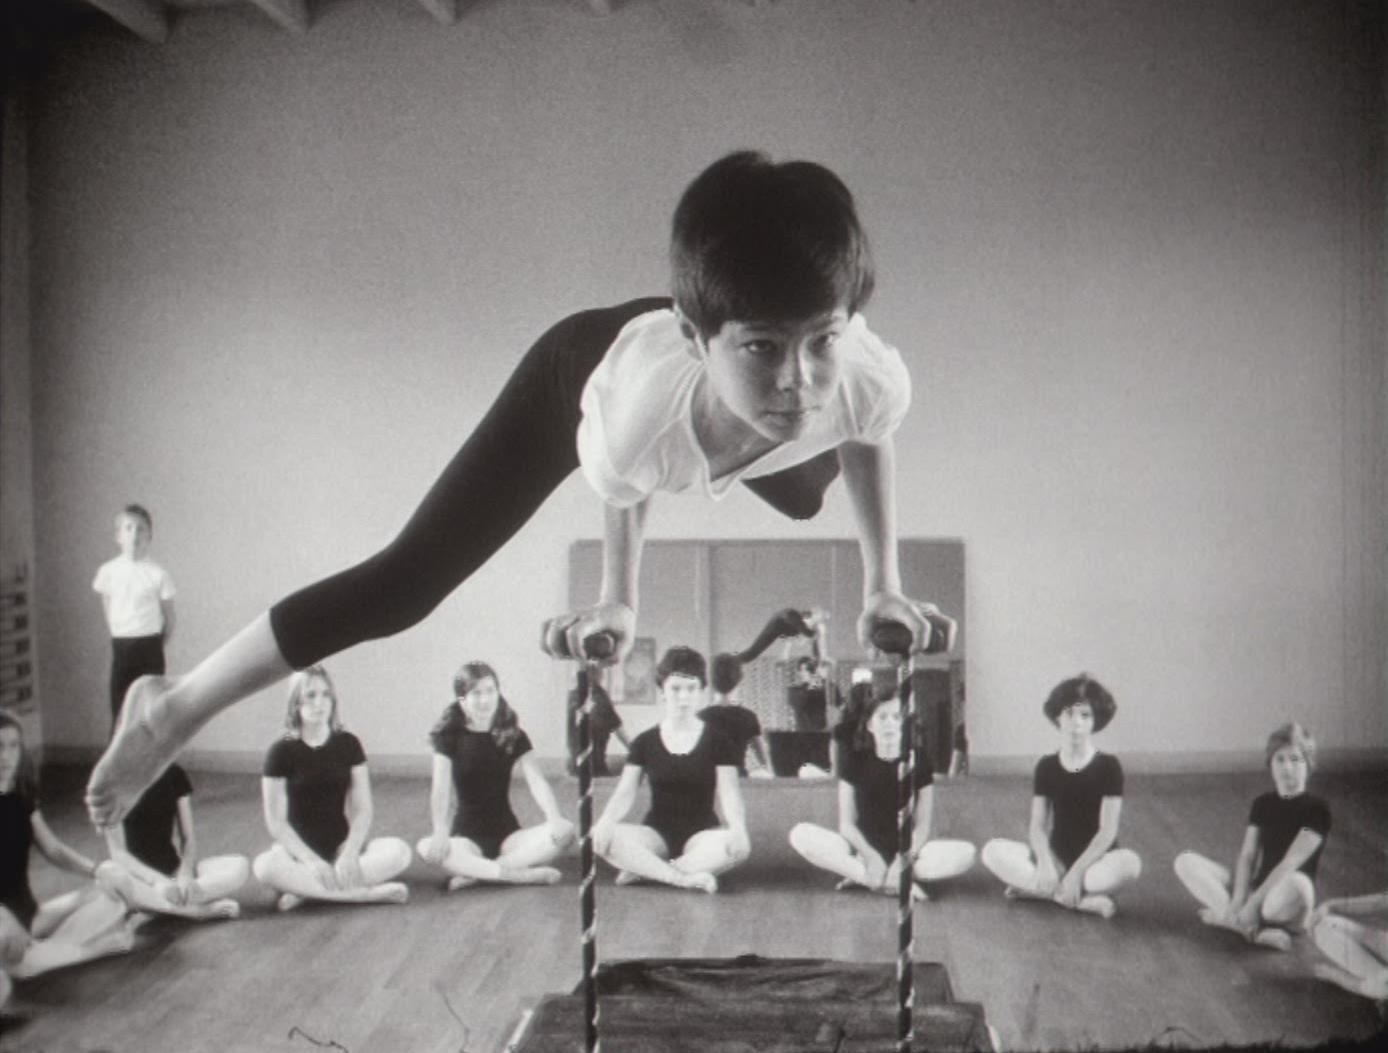 En cours de gymnastique artistique